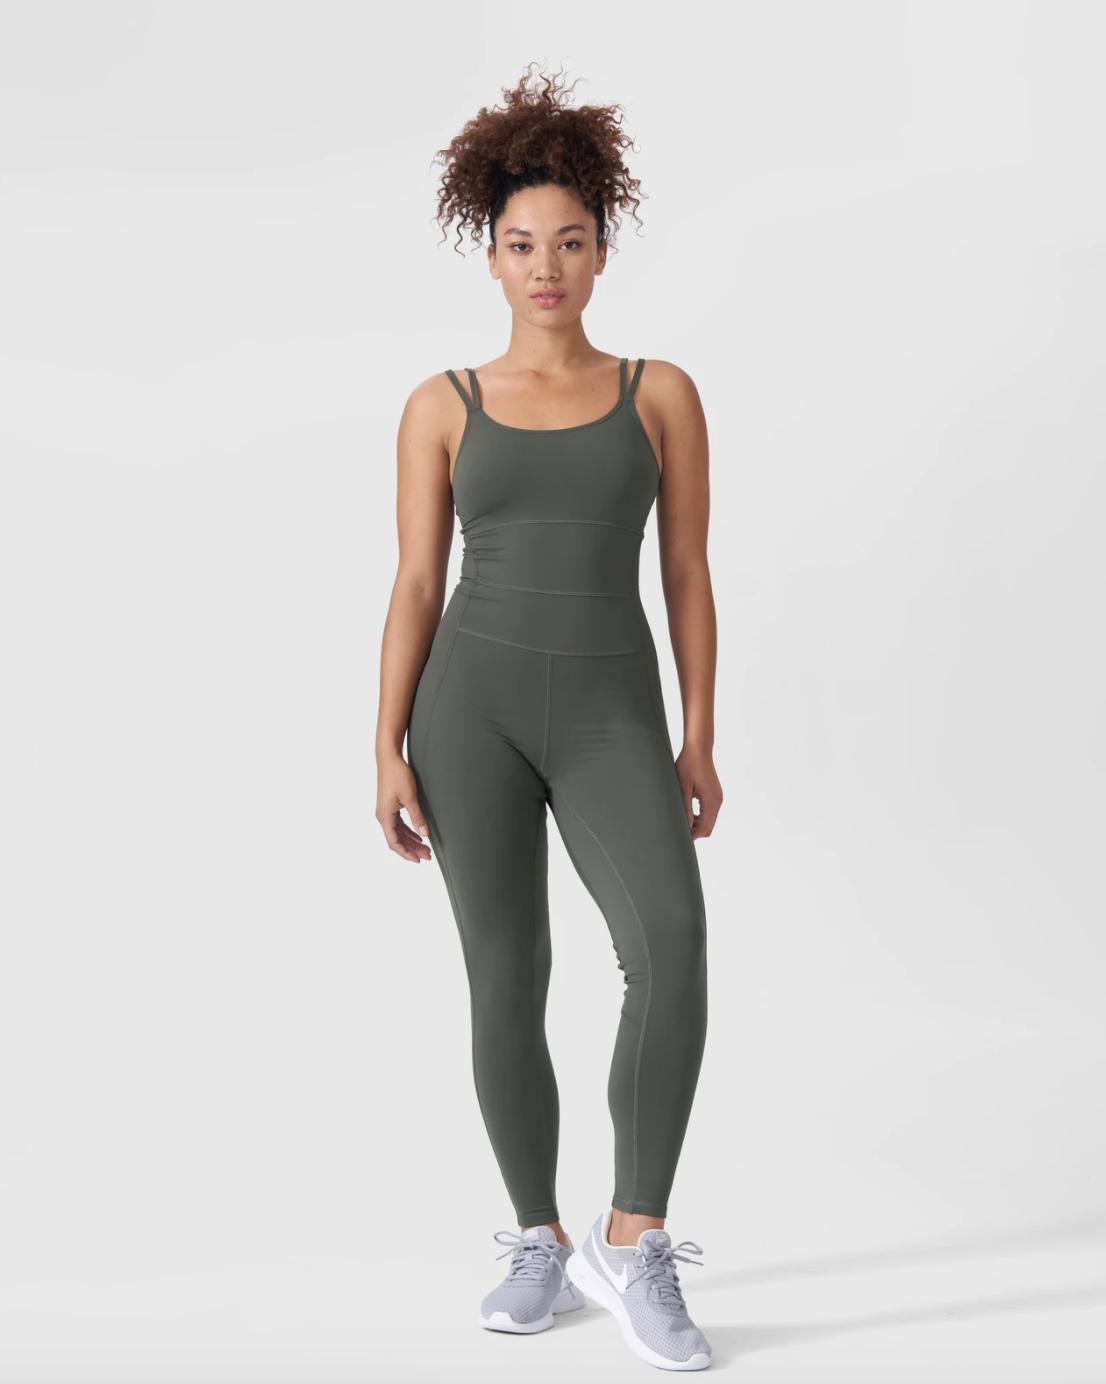 universal standard bodysuit